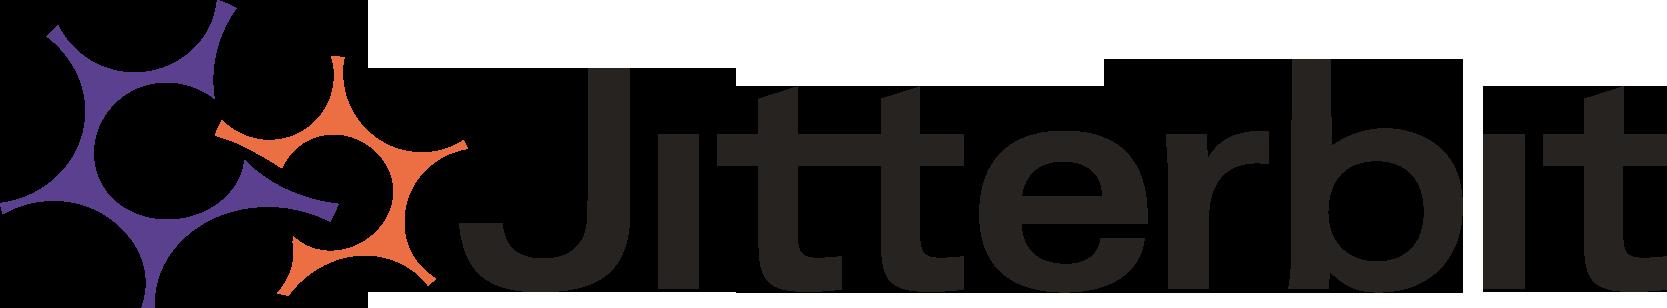 Jitterbit Partner Striped Giraffe